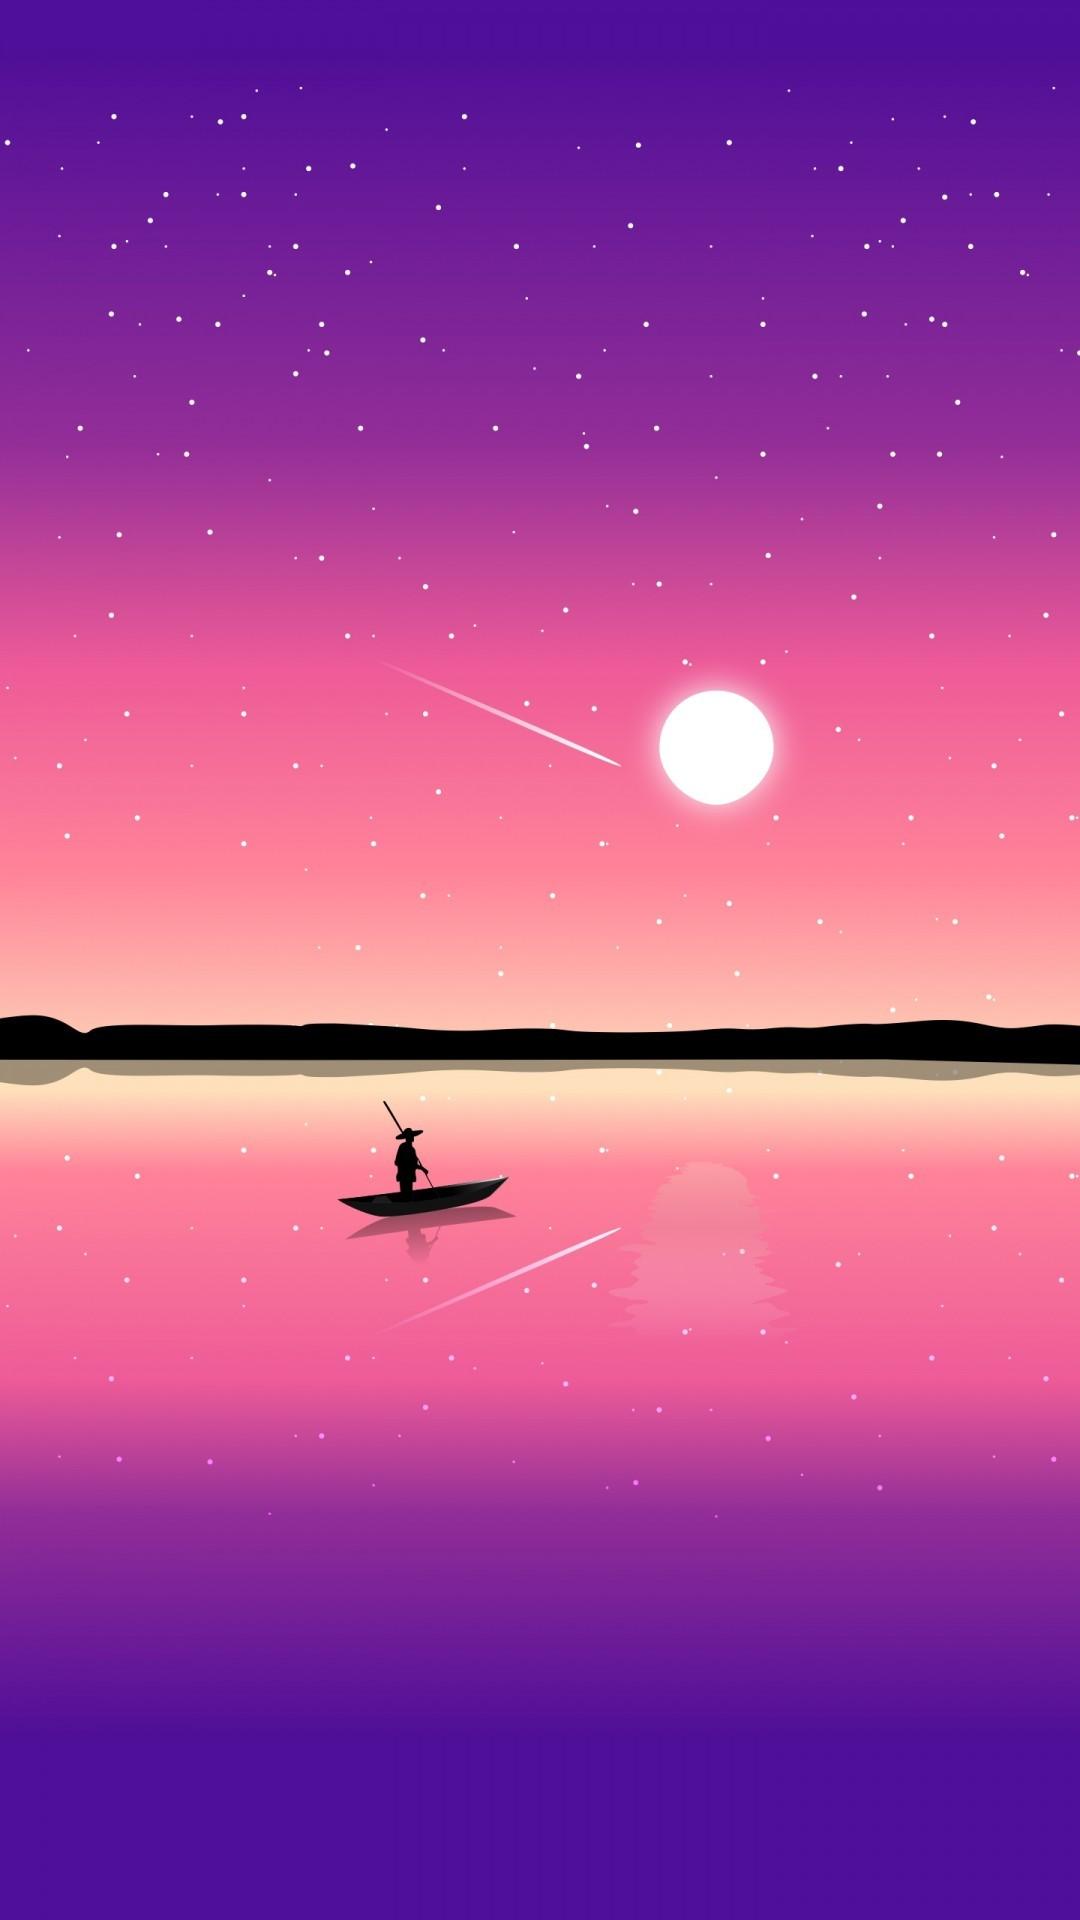 Free Sunset Illustration phone wallpaper by jessie1405